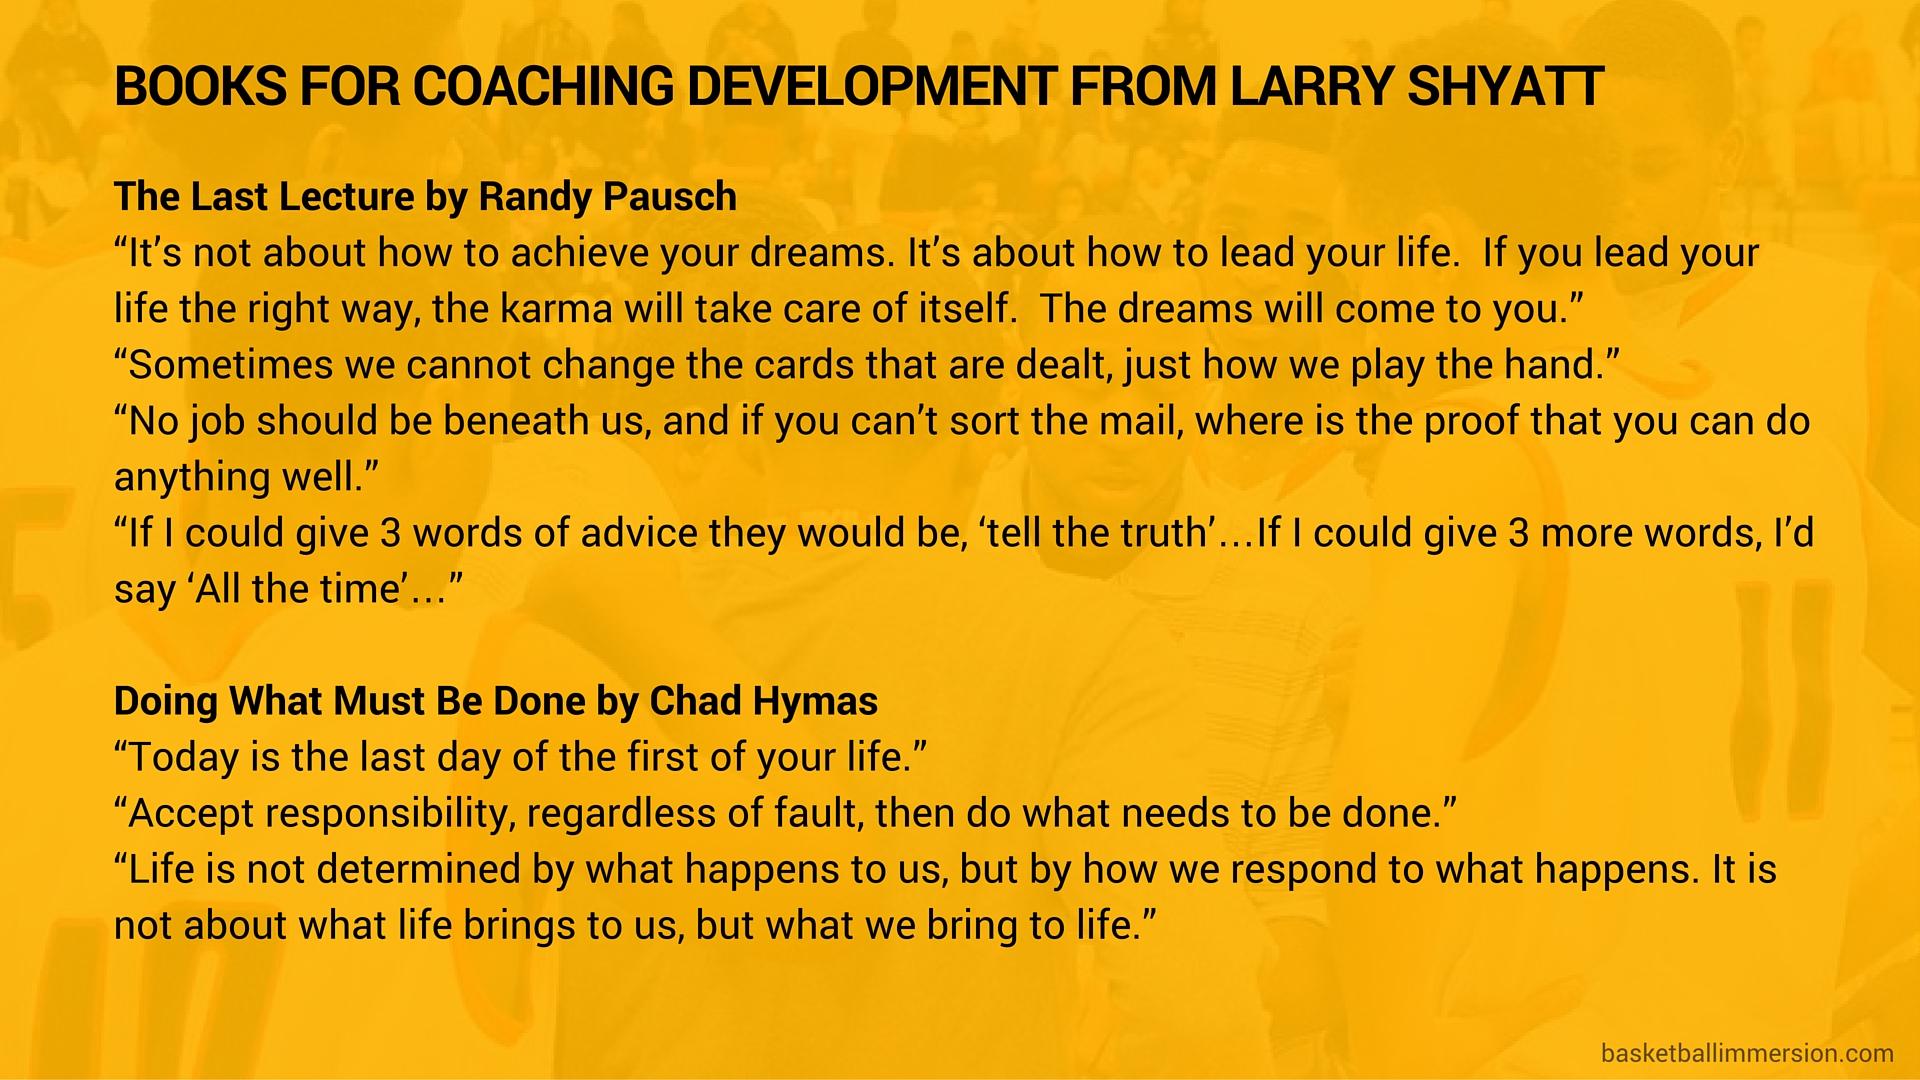 Larry Shyatt's Book Recommendations